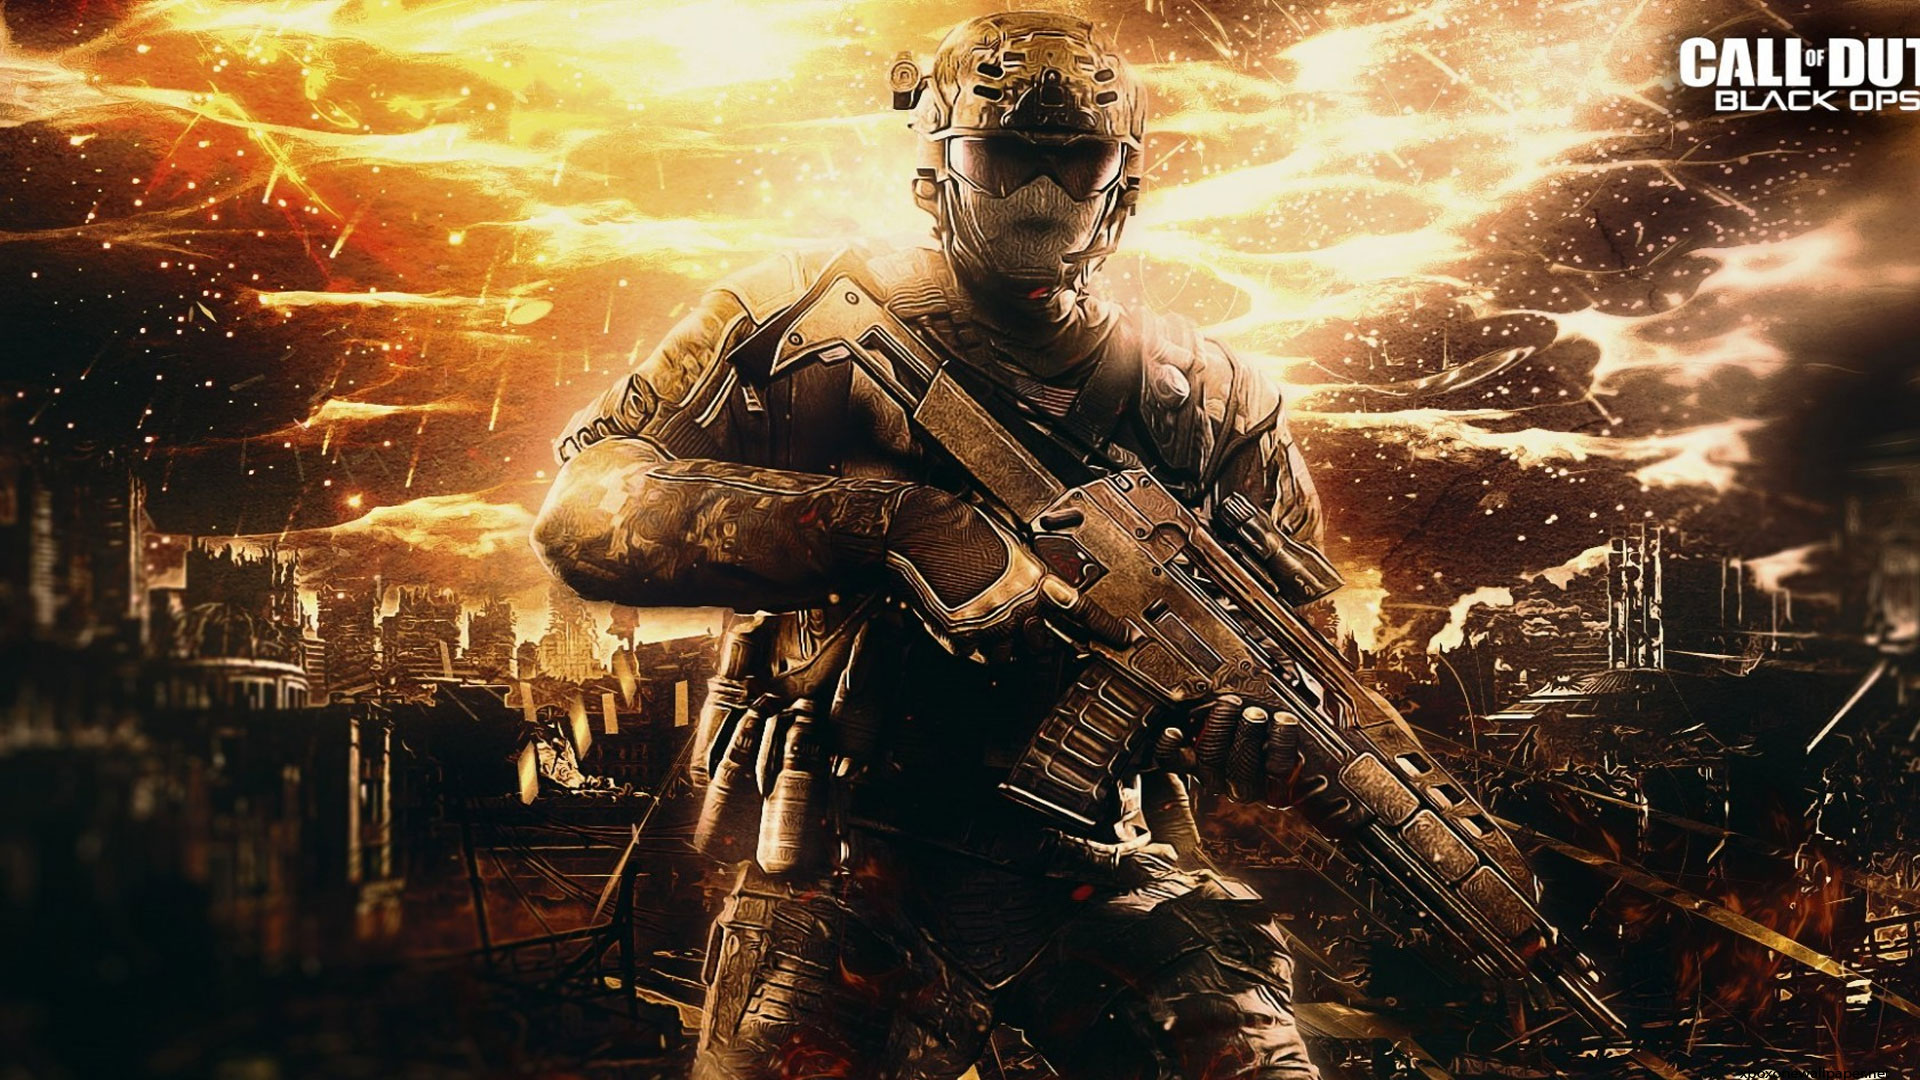 Call Of Duty Black Ops 2 Wallpaper Photo HD Wallpaper 1080p 1920x1080